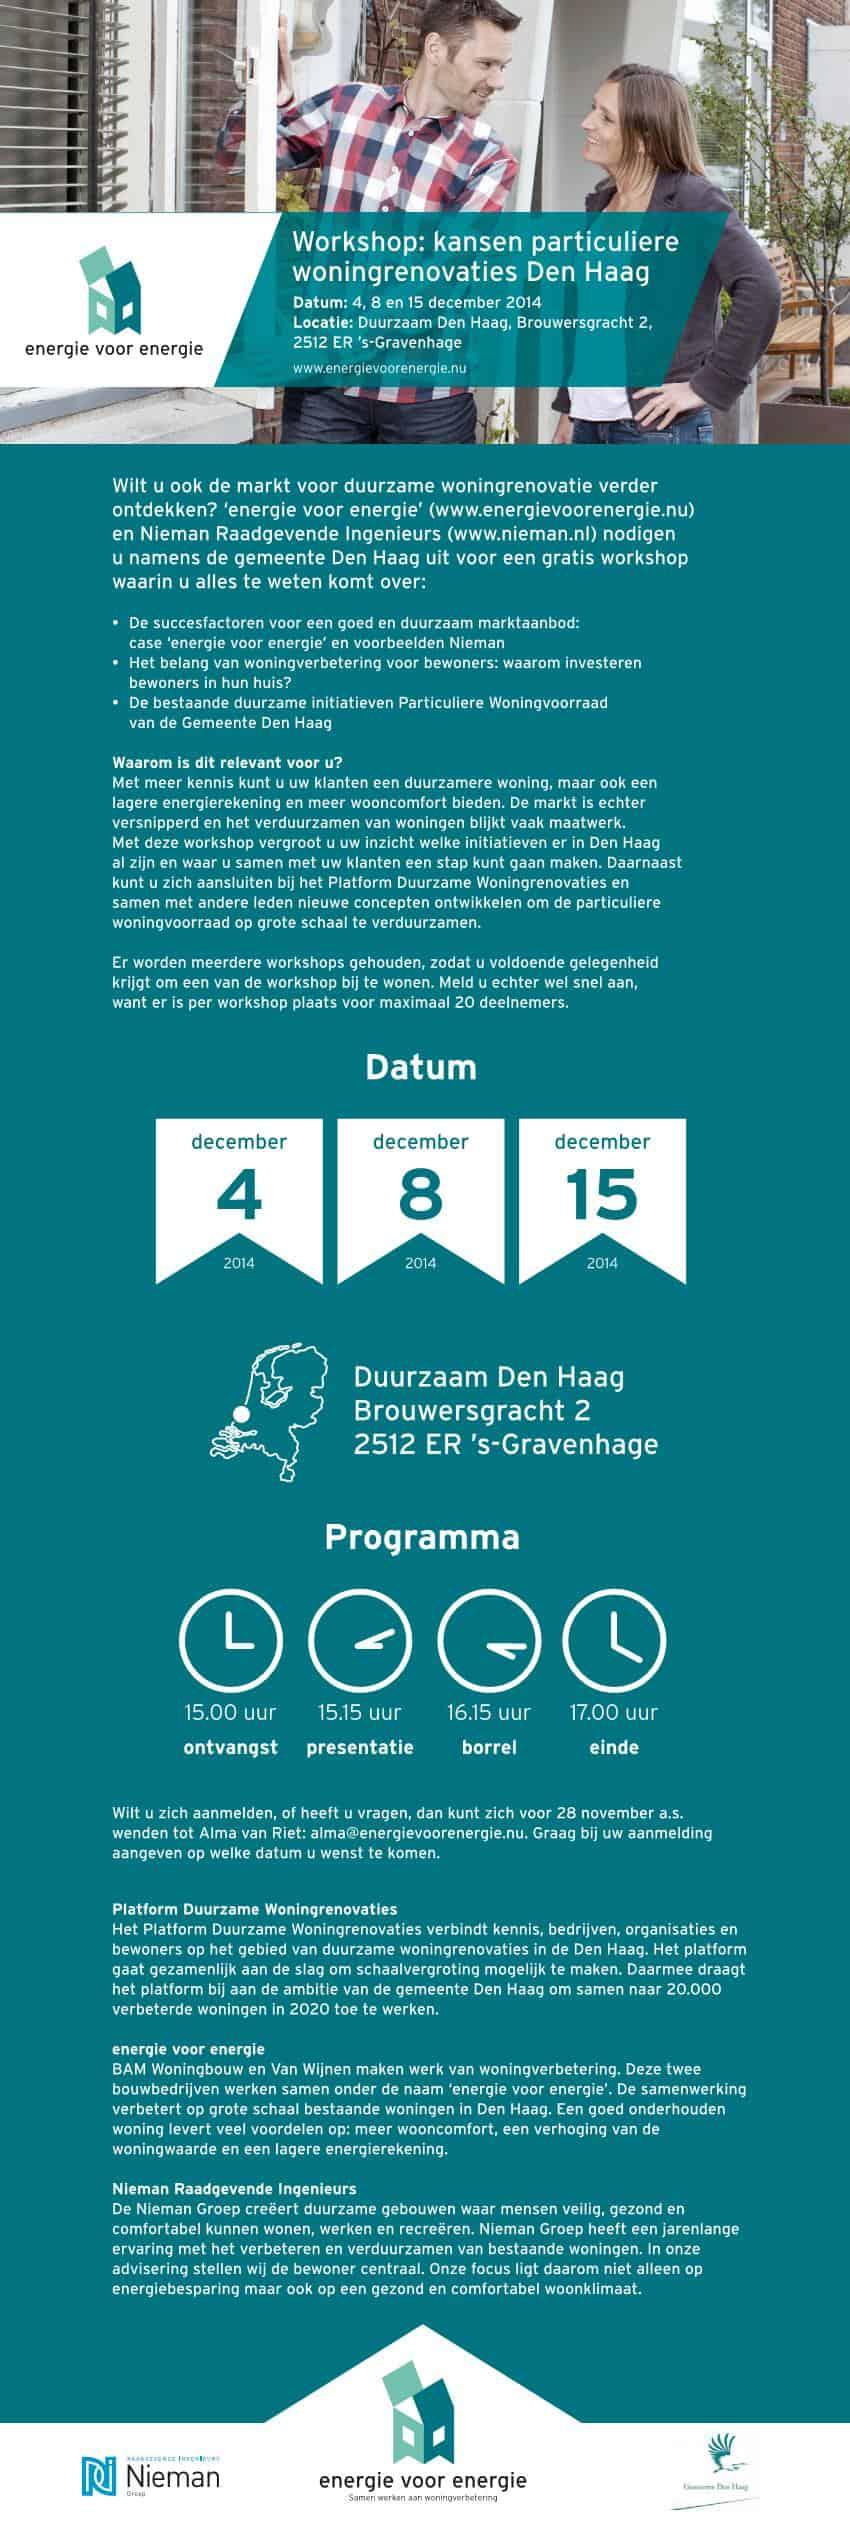 EVE Uitnodiging Workshop Platform Duurzame Woningrenovaties